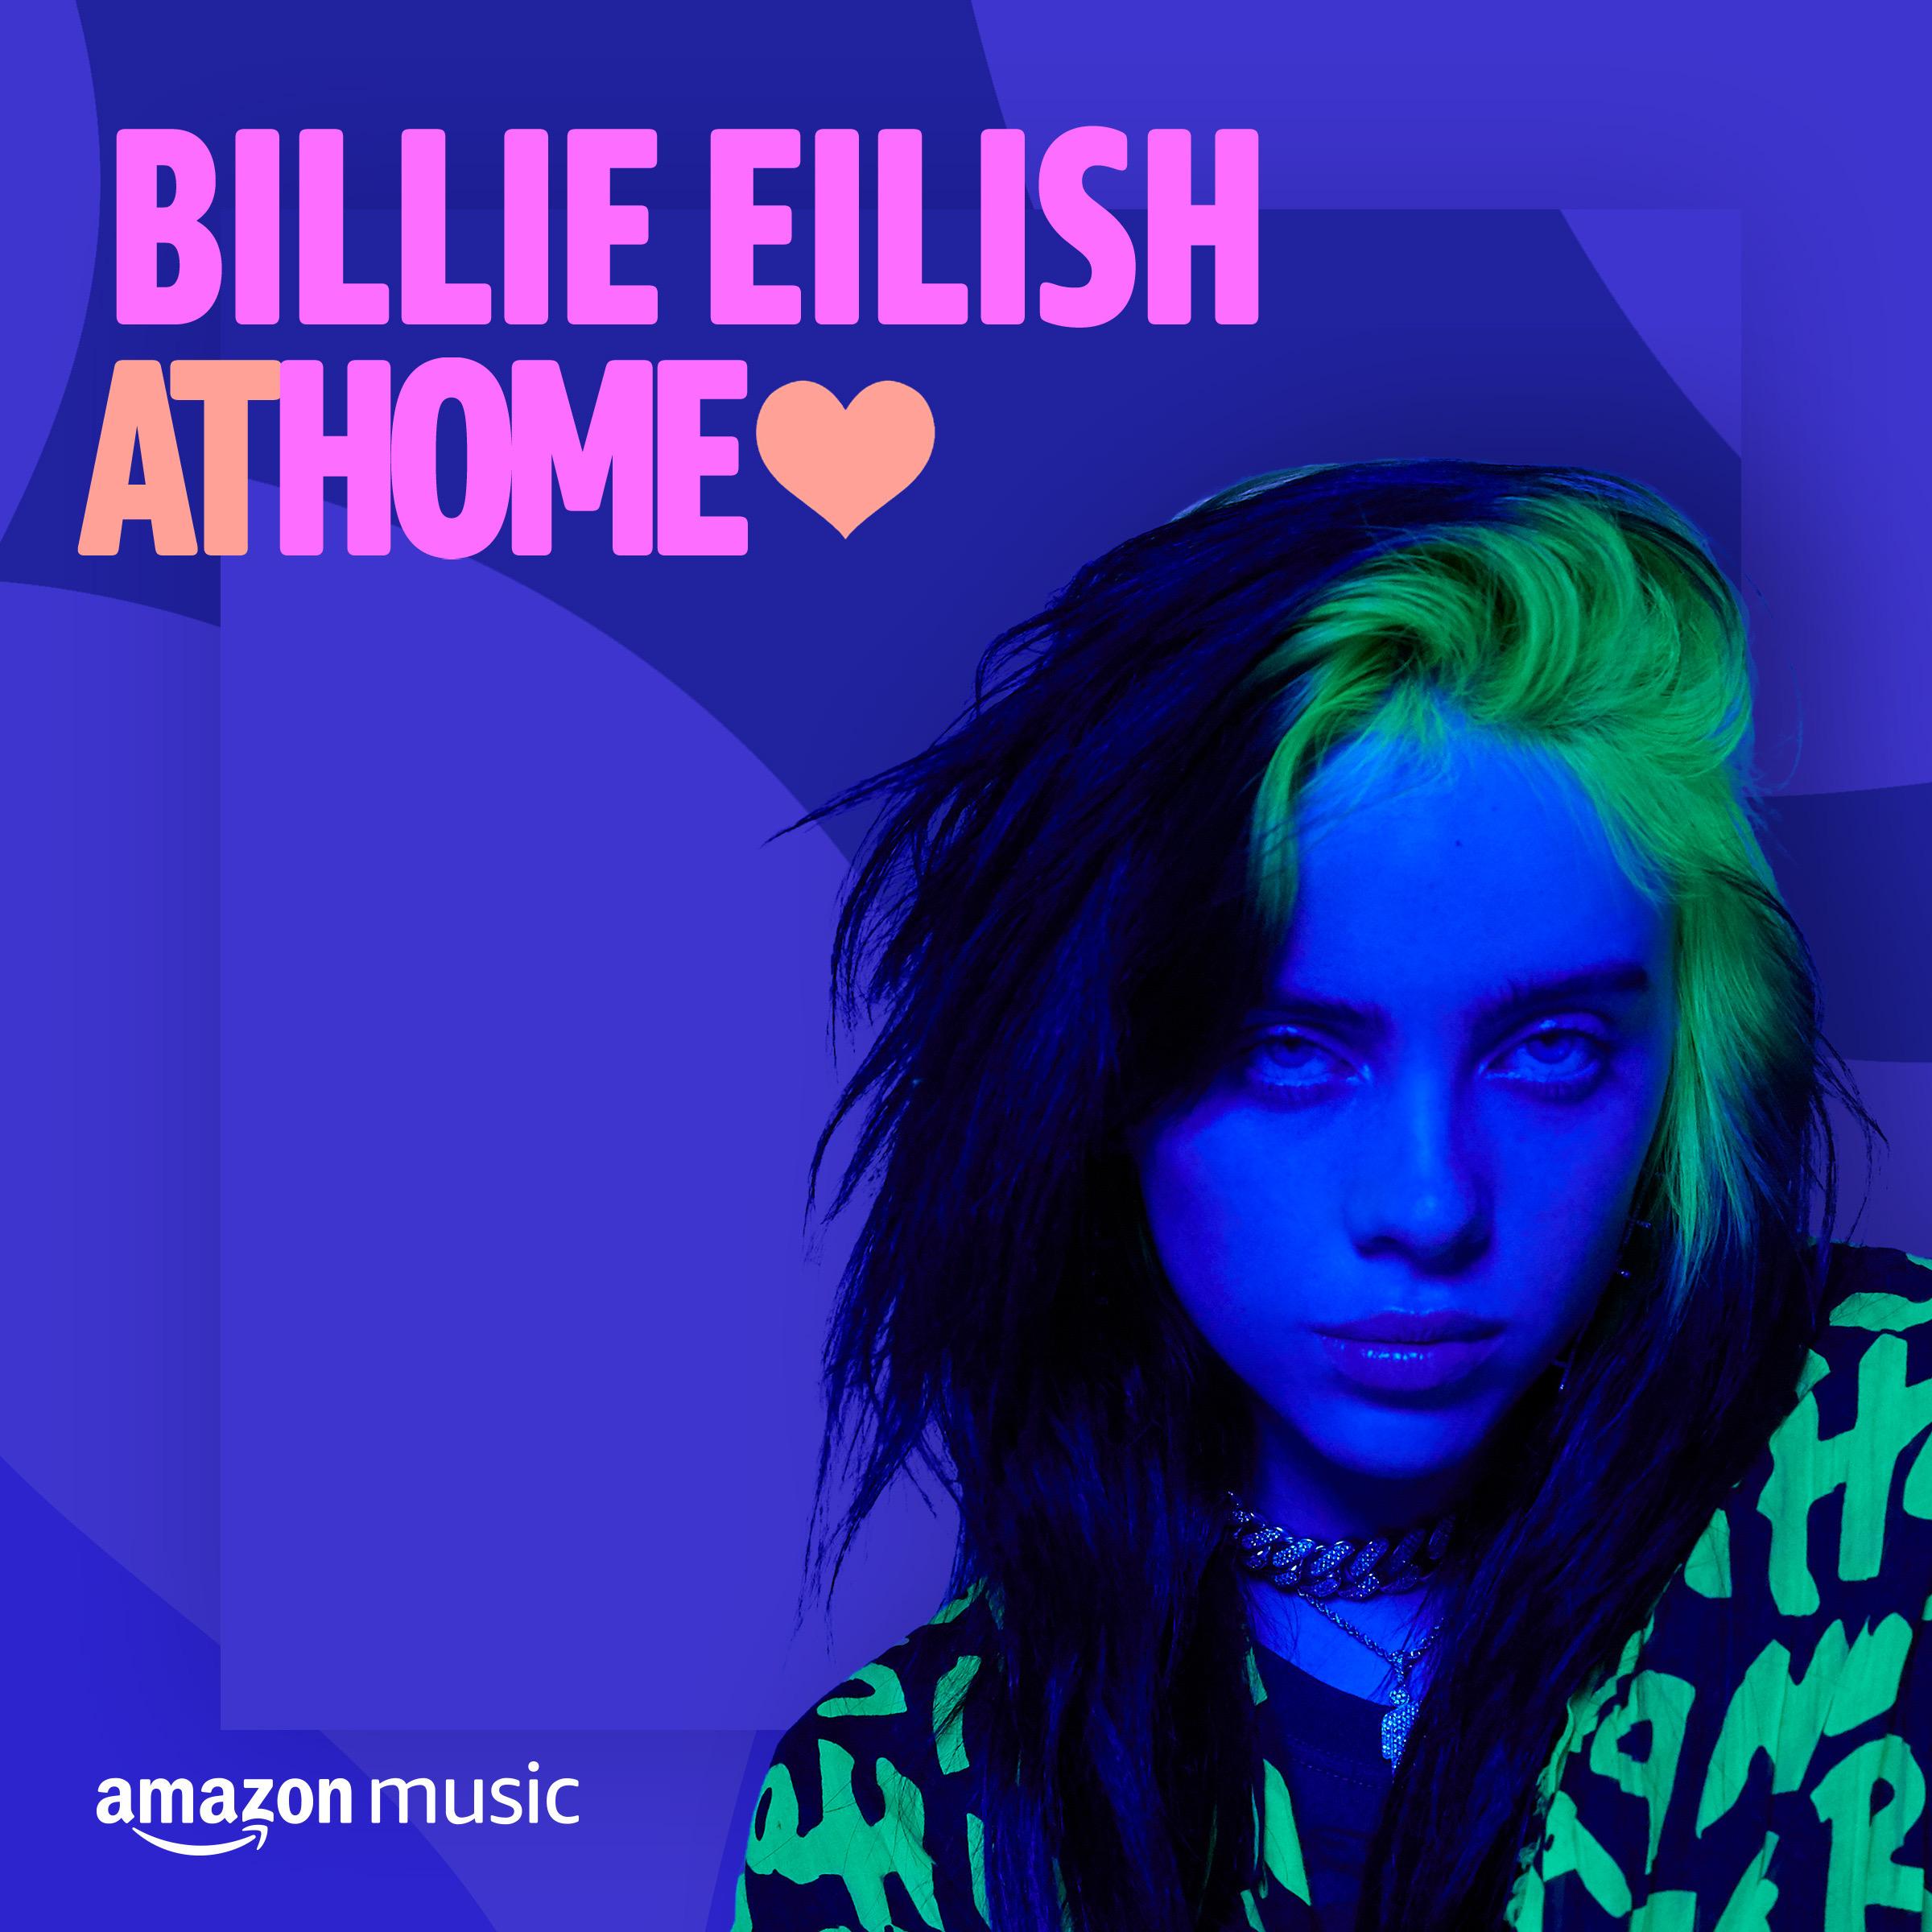 https://www.billieforum.com/media/billie_at_home_playlist-jpg.4347/full